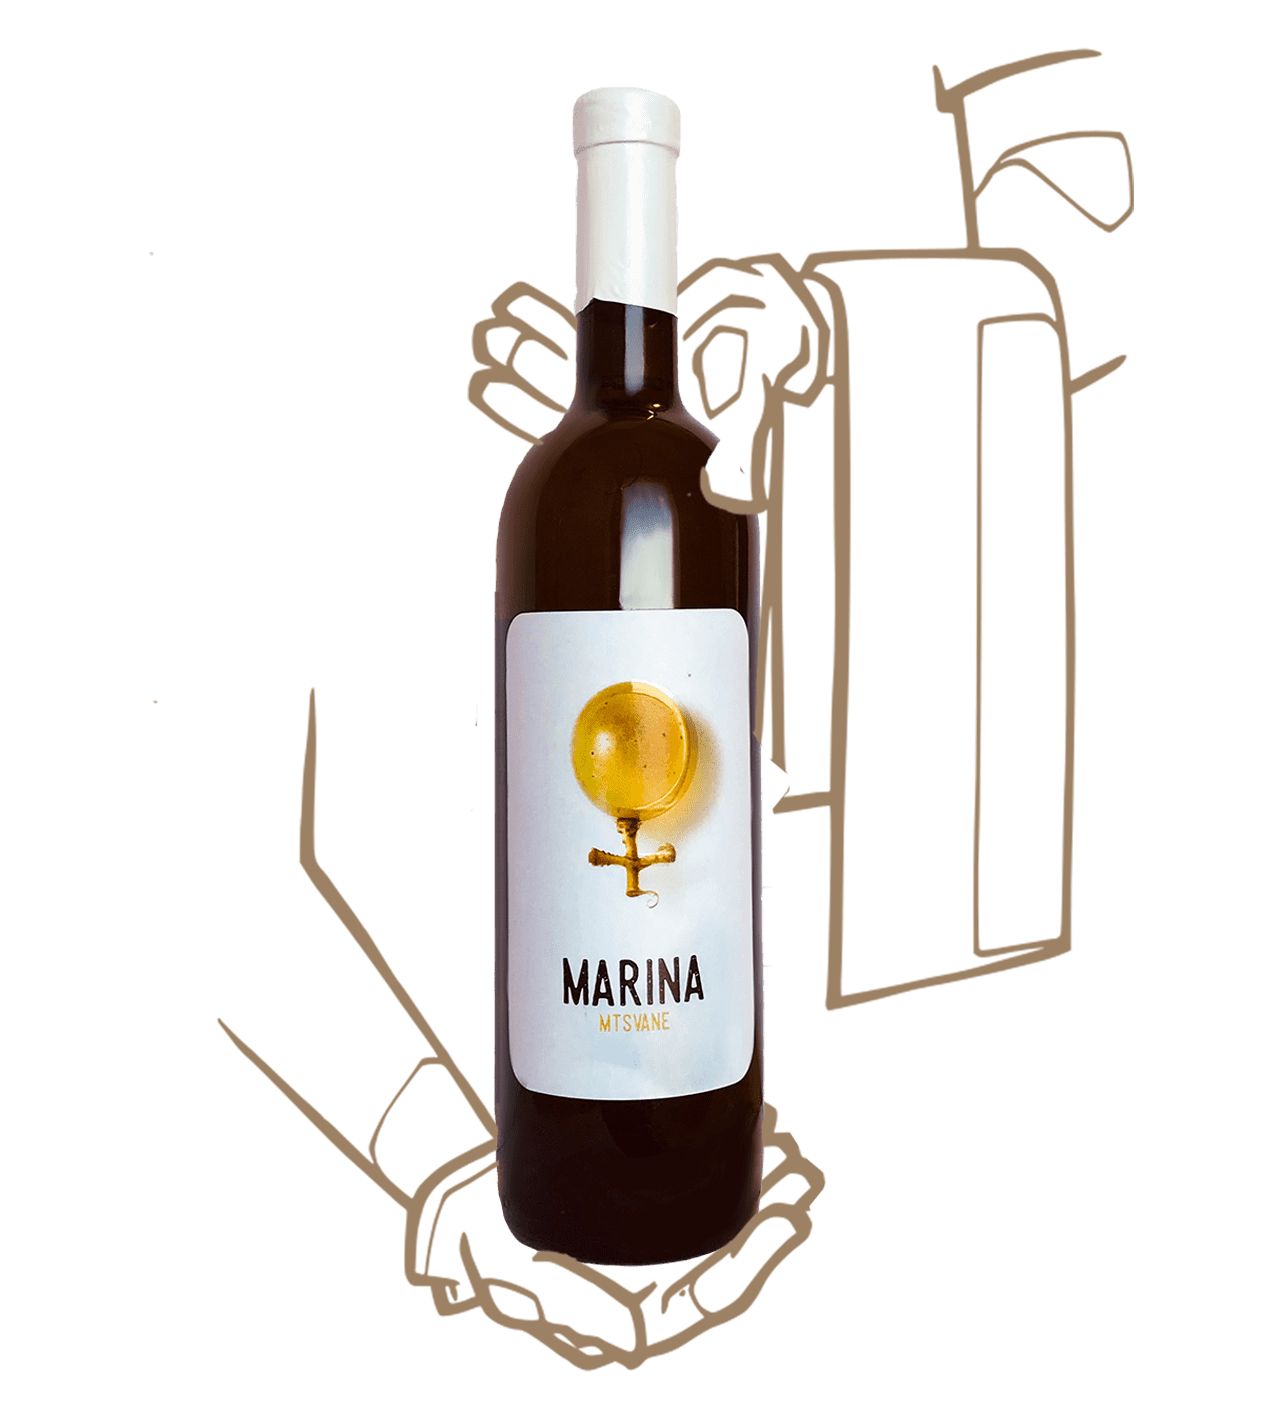 Marina de Iago's wine est un vin naturel de Géorgie